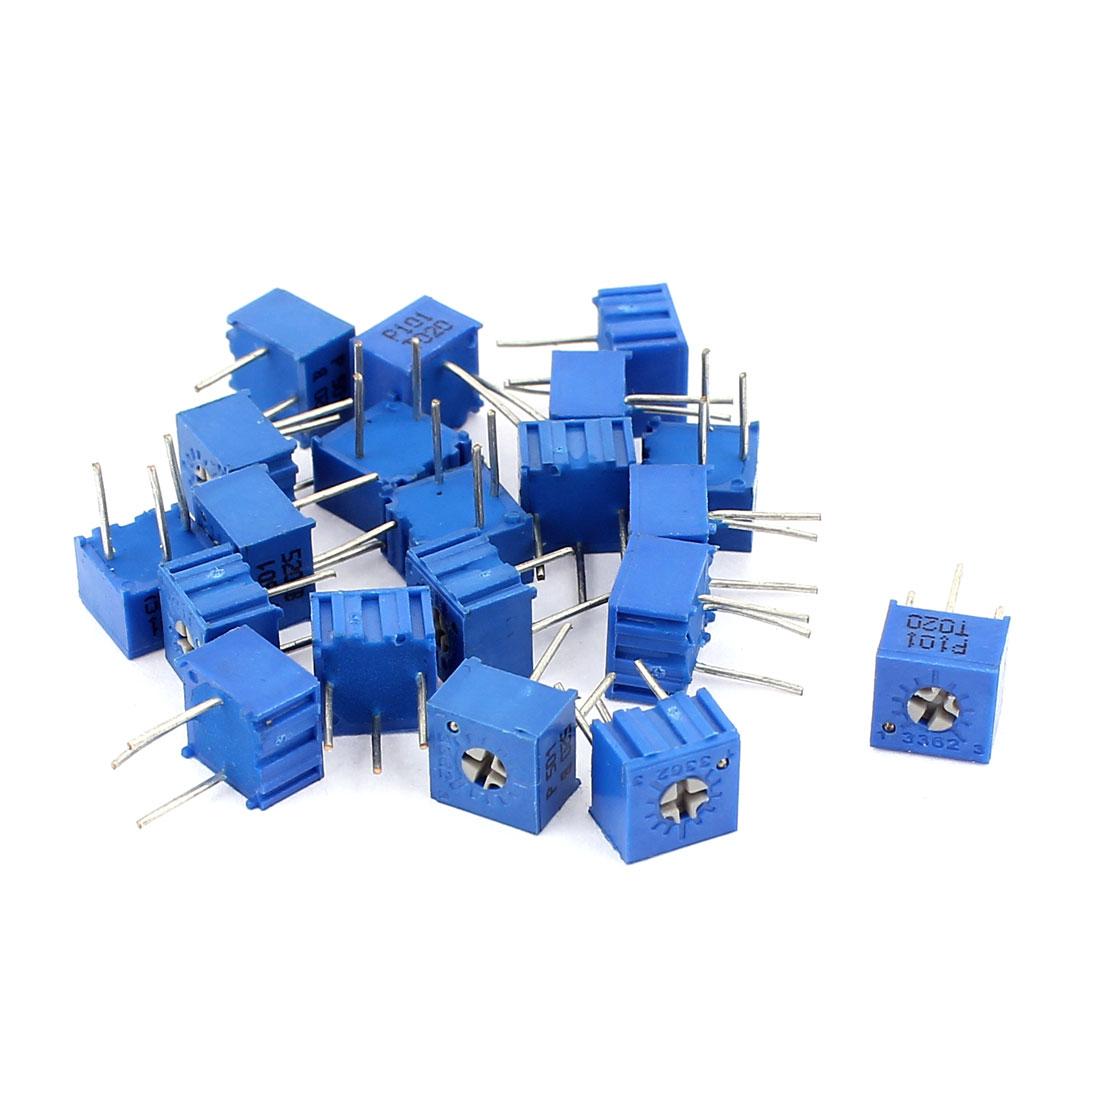 20Pcs Potentiometer Trimmer Variable Resistor 3362P-501 3362P-101